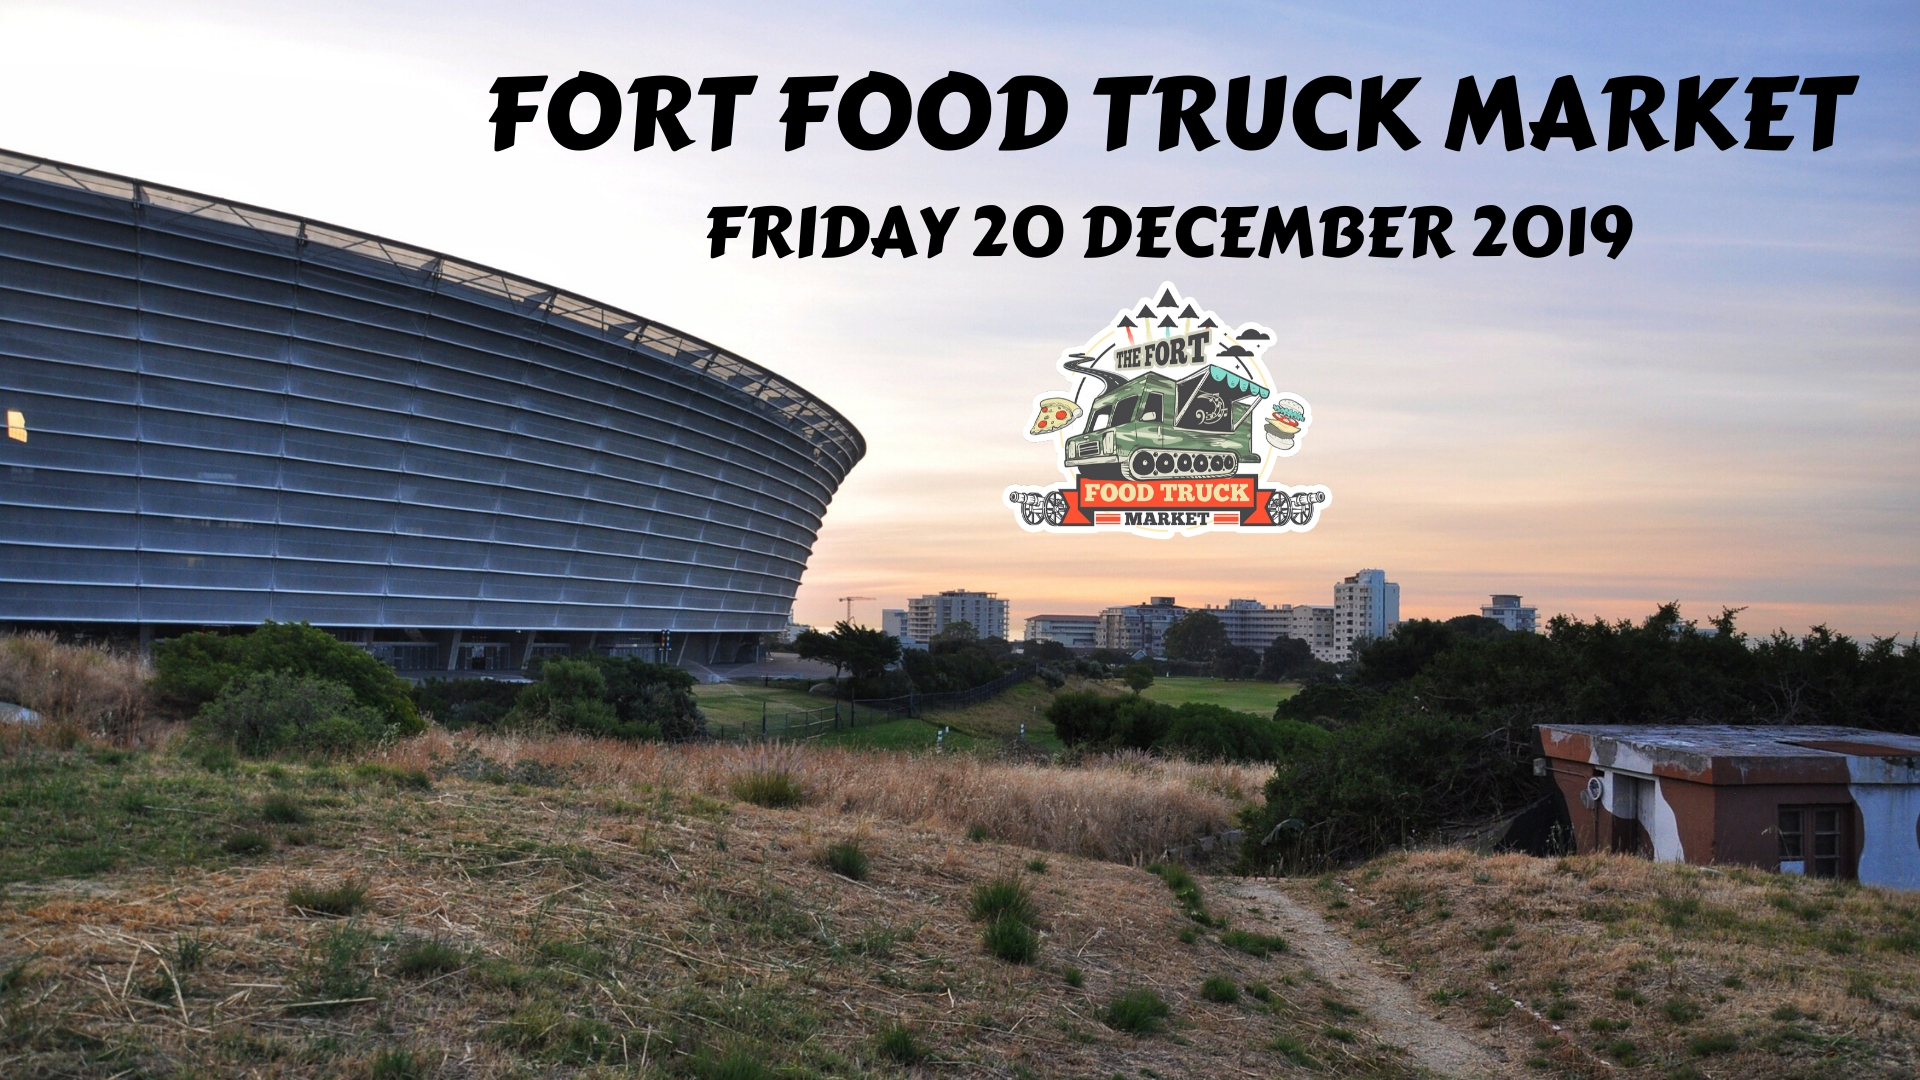 The Fort Food Truck Market - Fri 20 Dec